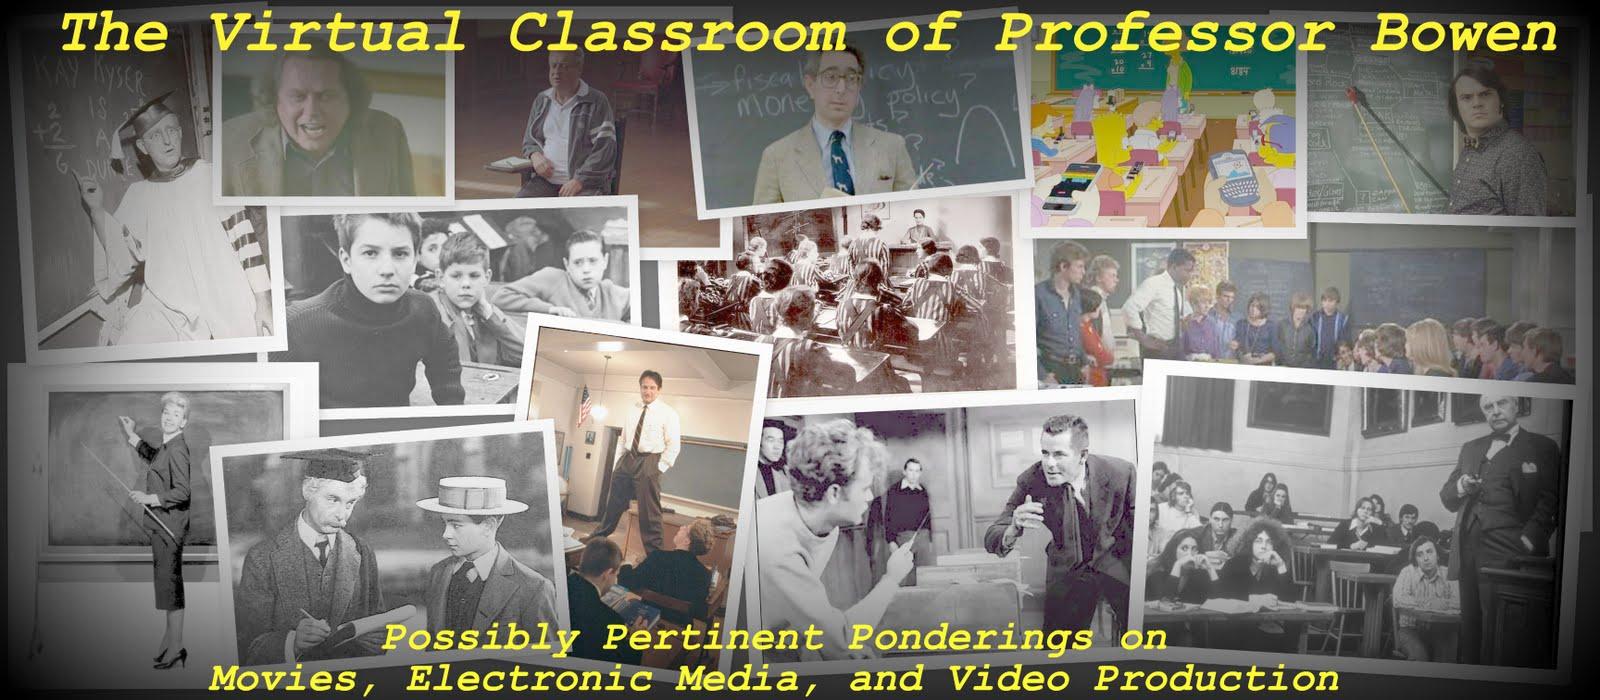 The Virtual Classroom of Professor Bowen